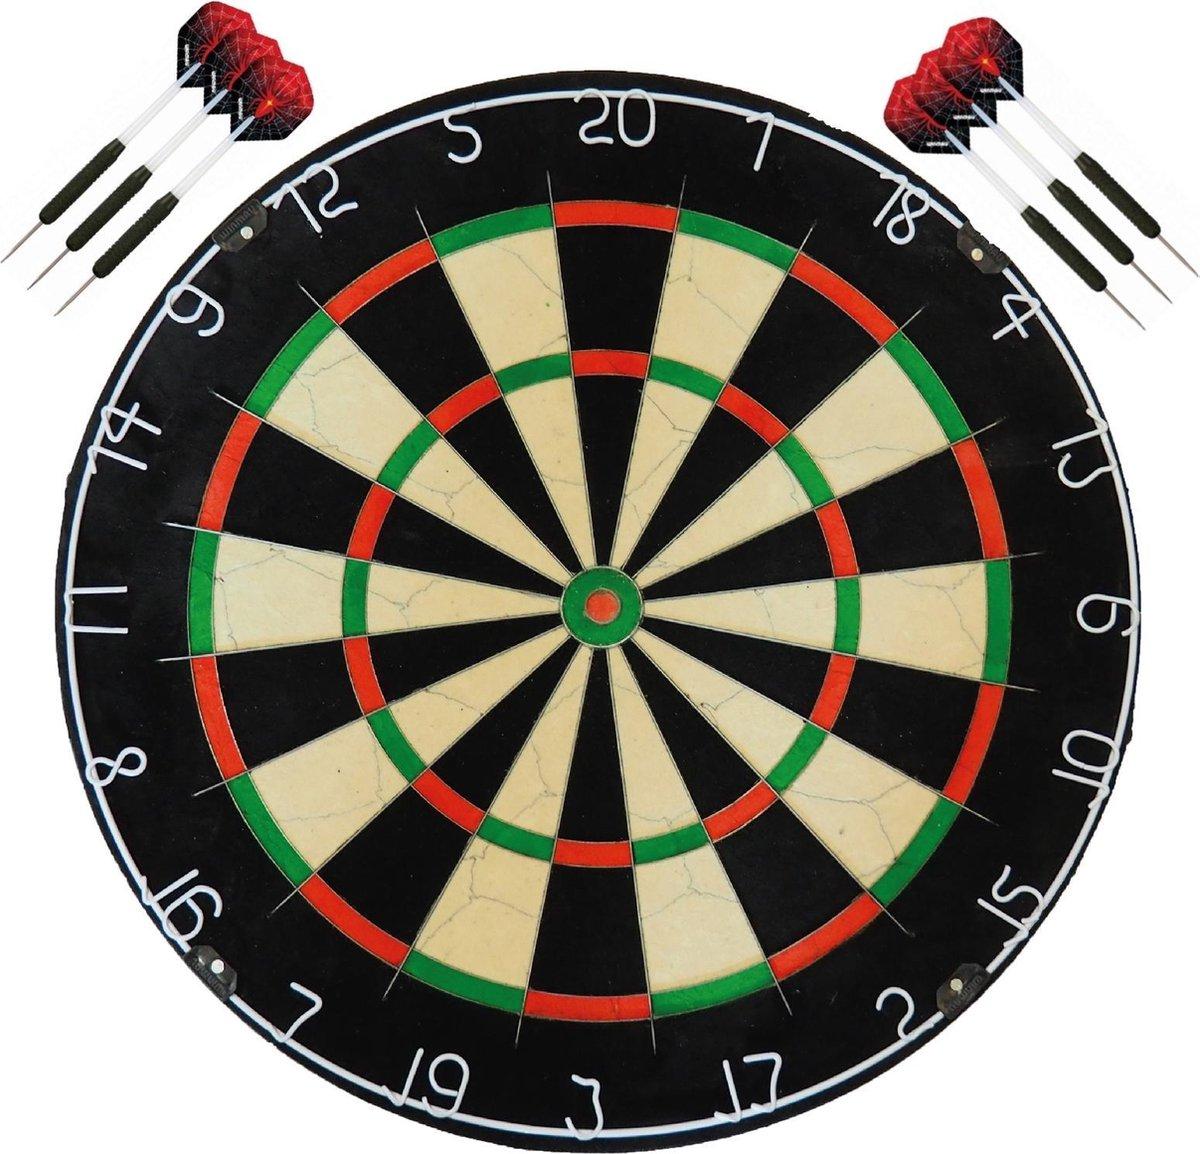 A-Merk BEST geteste dartbord bristle - dartbord - dartboard plus 2 sets - dartpijlen - Dragon darts